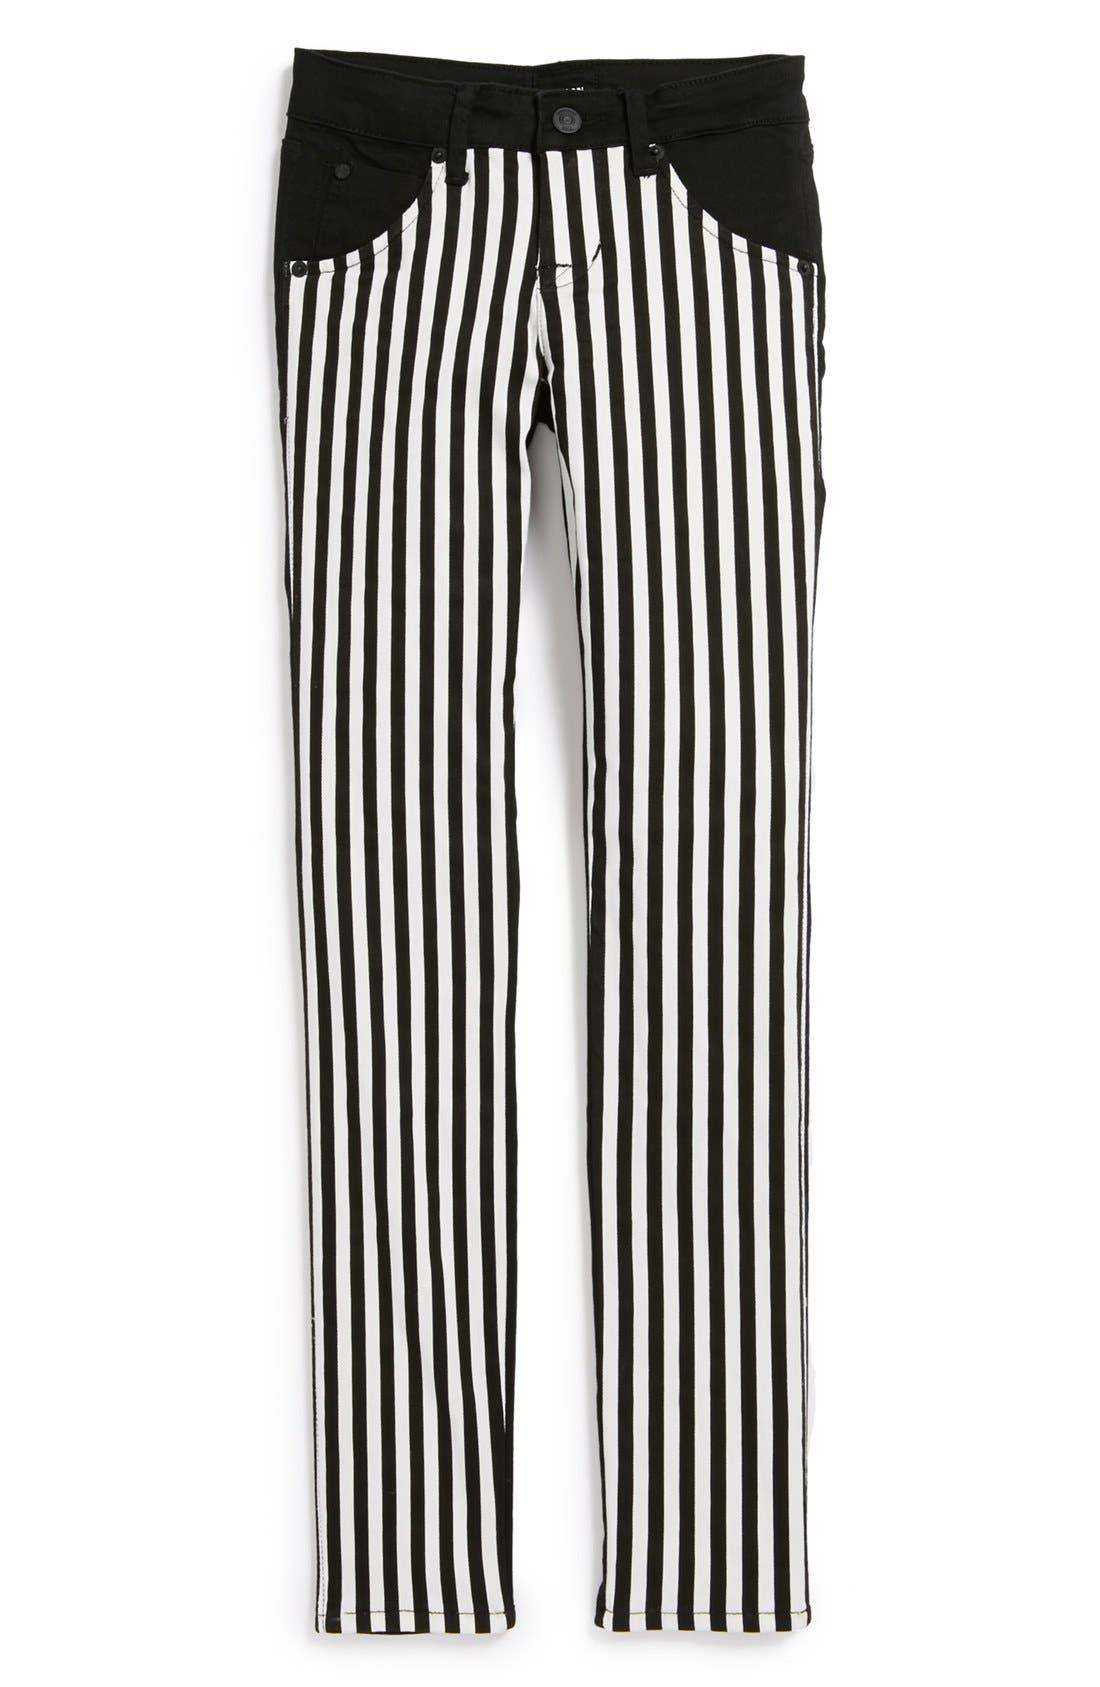 Main Image - Hudson Kids 'Collin' Skinny Jeans (Vice Versa) (Big Girls)